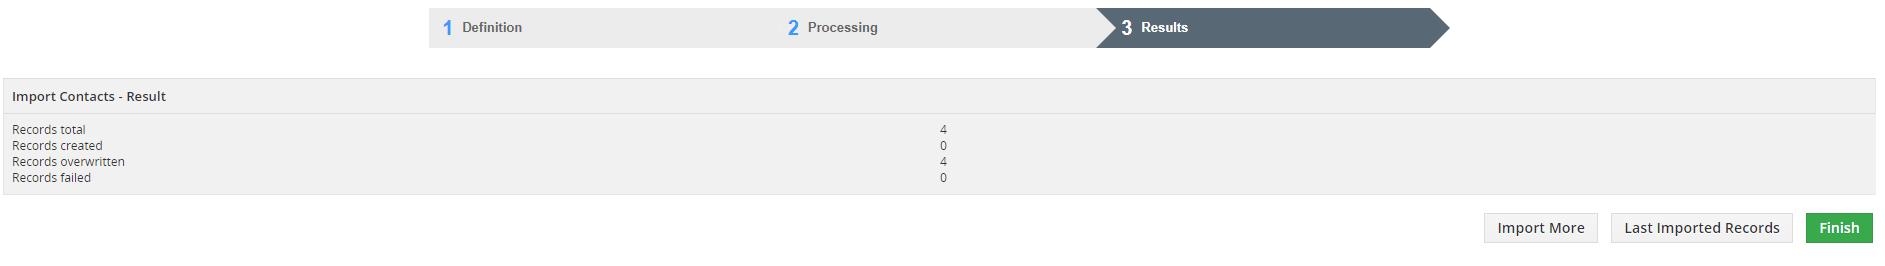 XLS import overwrite method